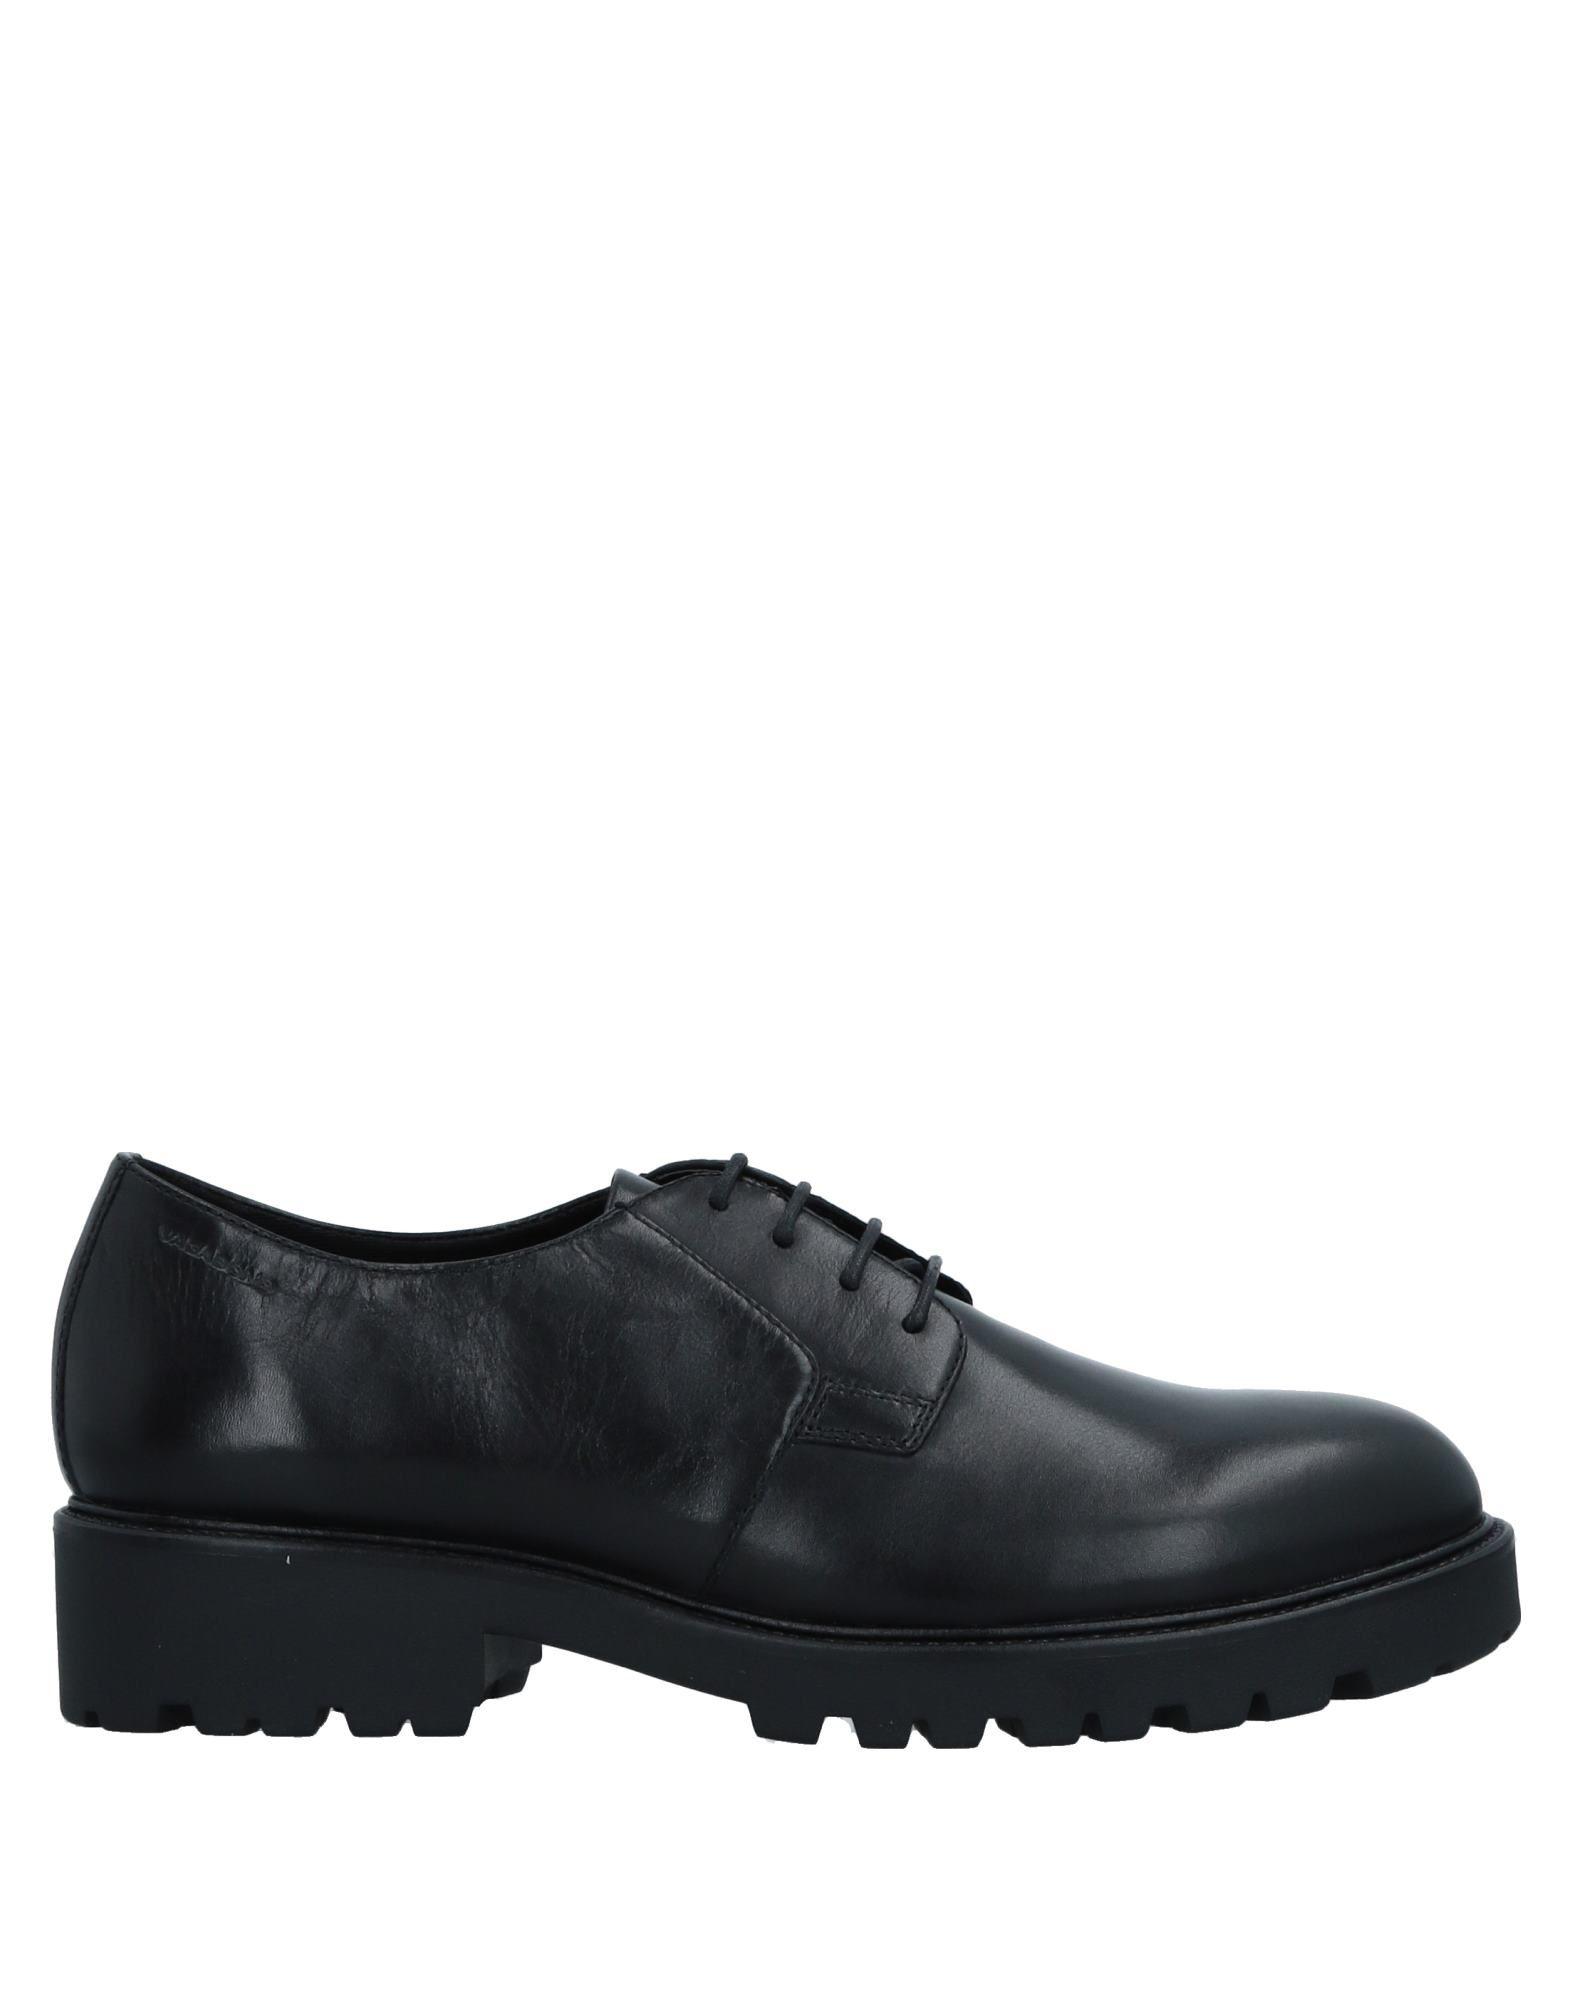 Stringate Vagabond Shoemakers Donna Donna Shoemakers - 11519400CH 737b73